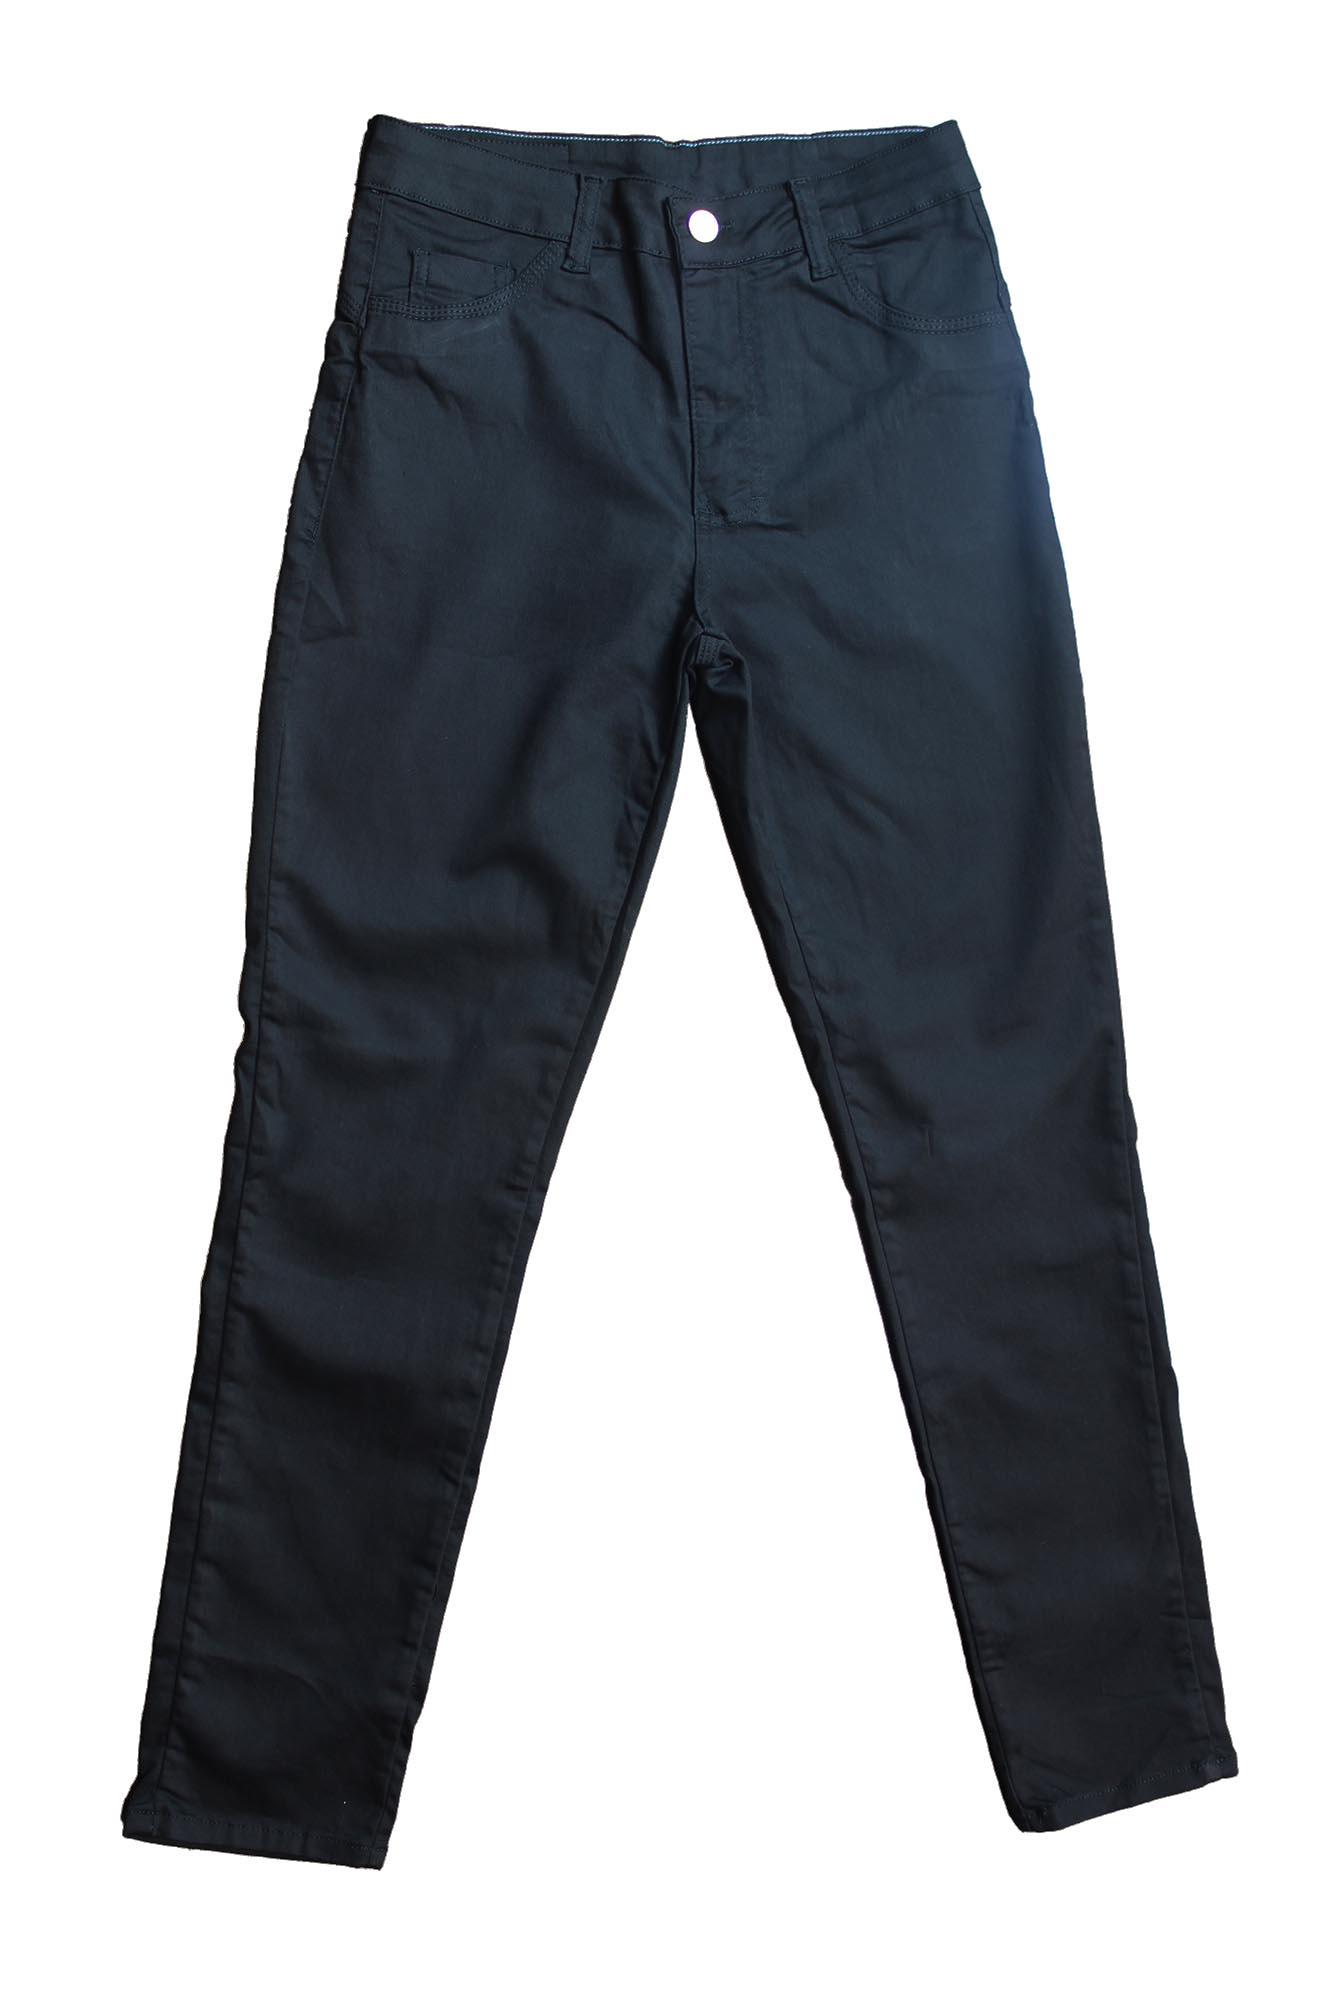 Calça Jeans Feminina Plus Size - Preta